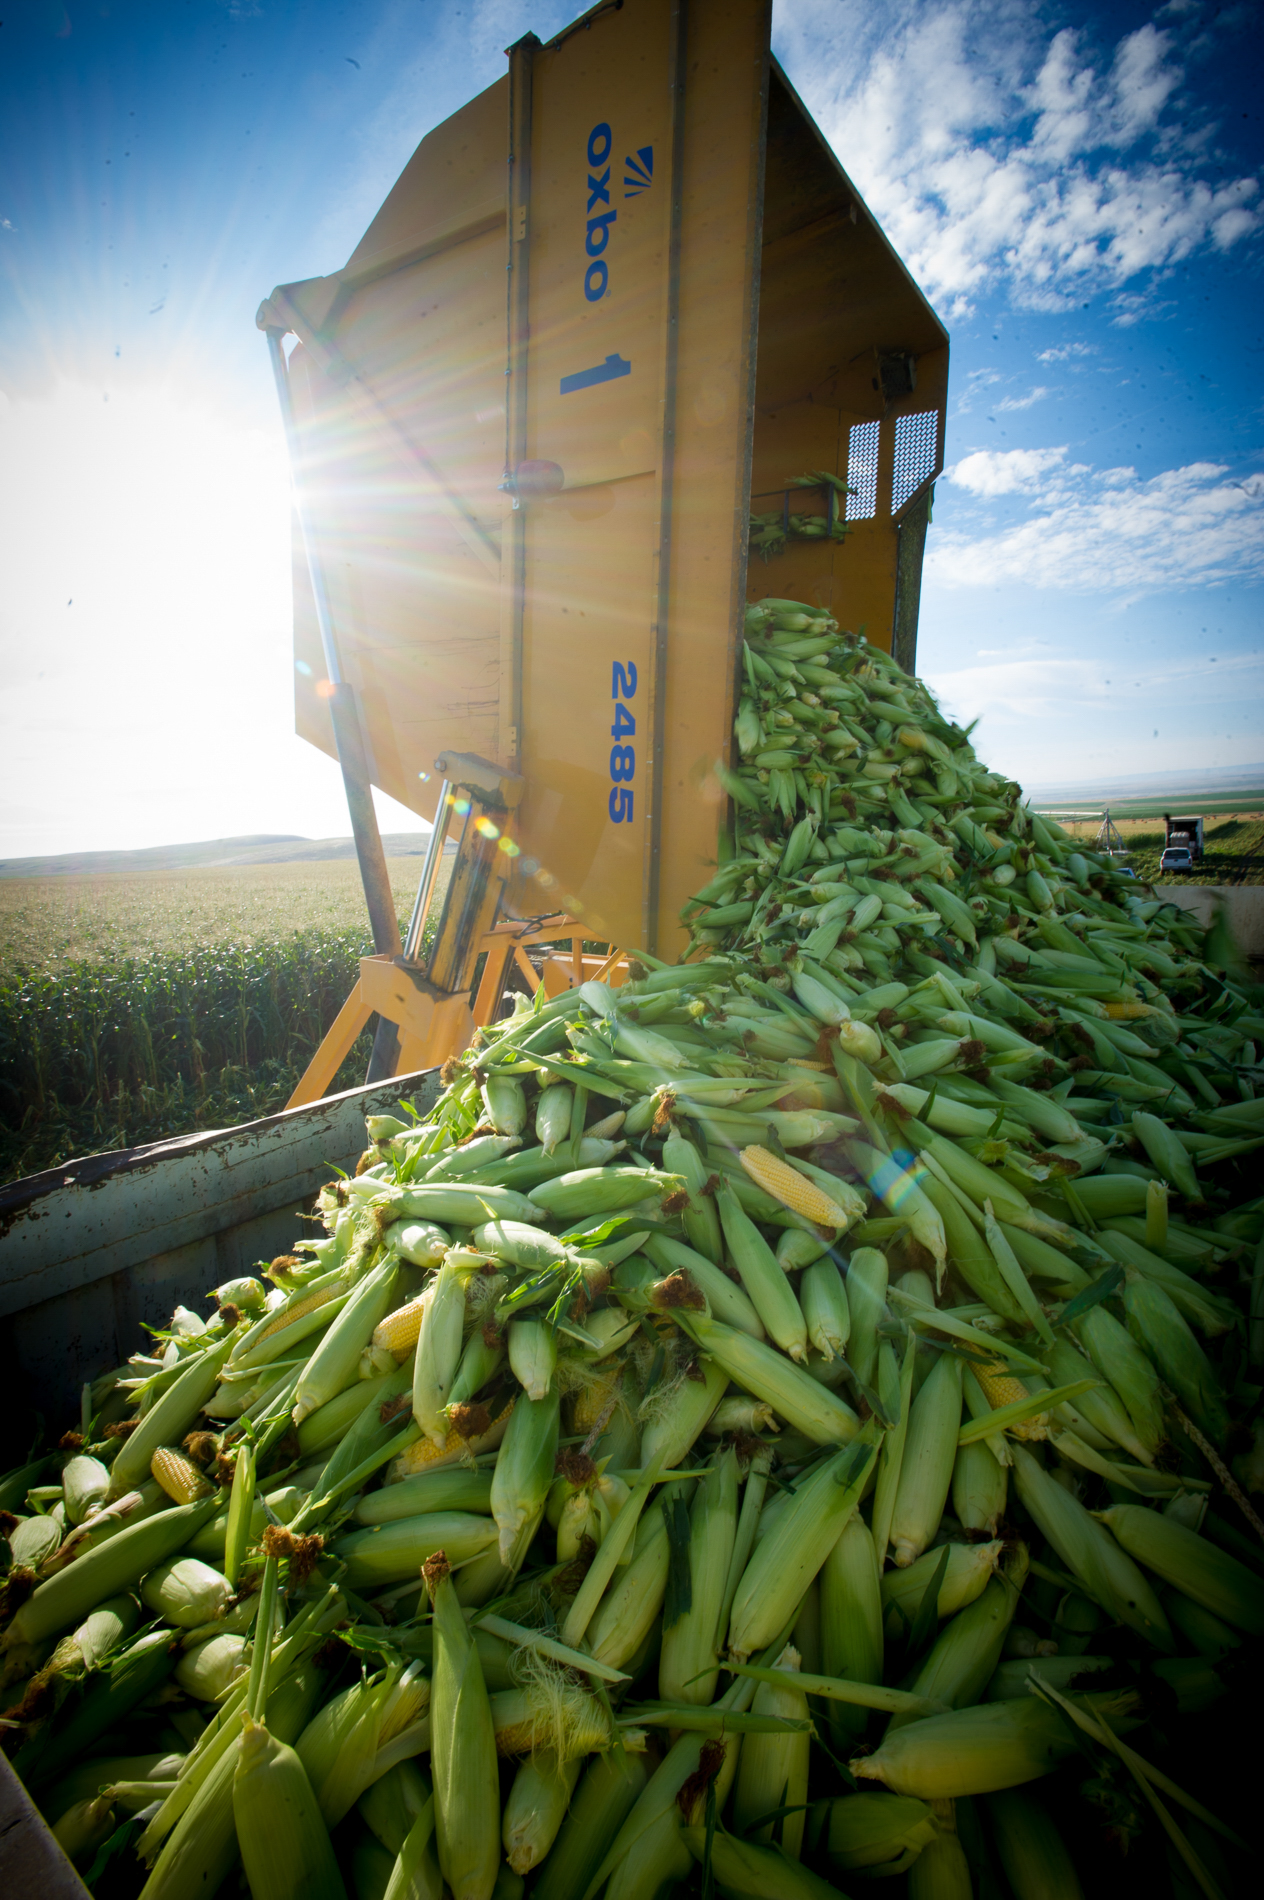 Dumping Corn